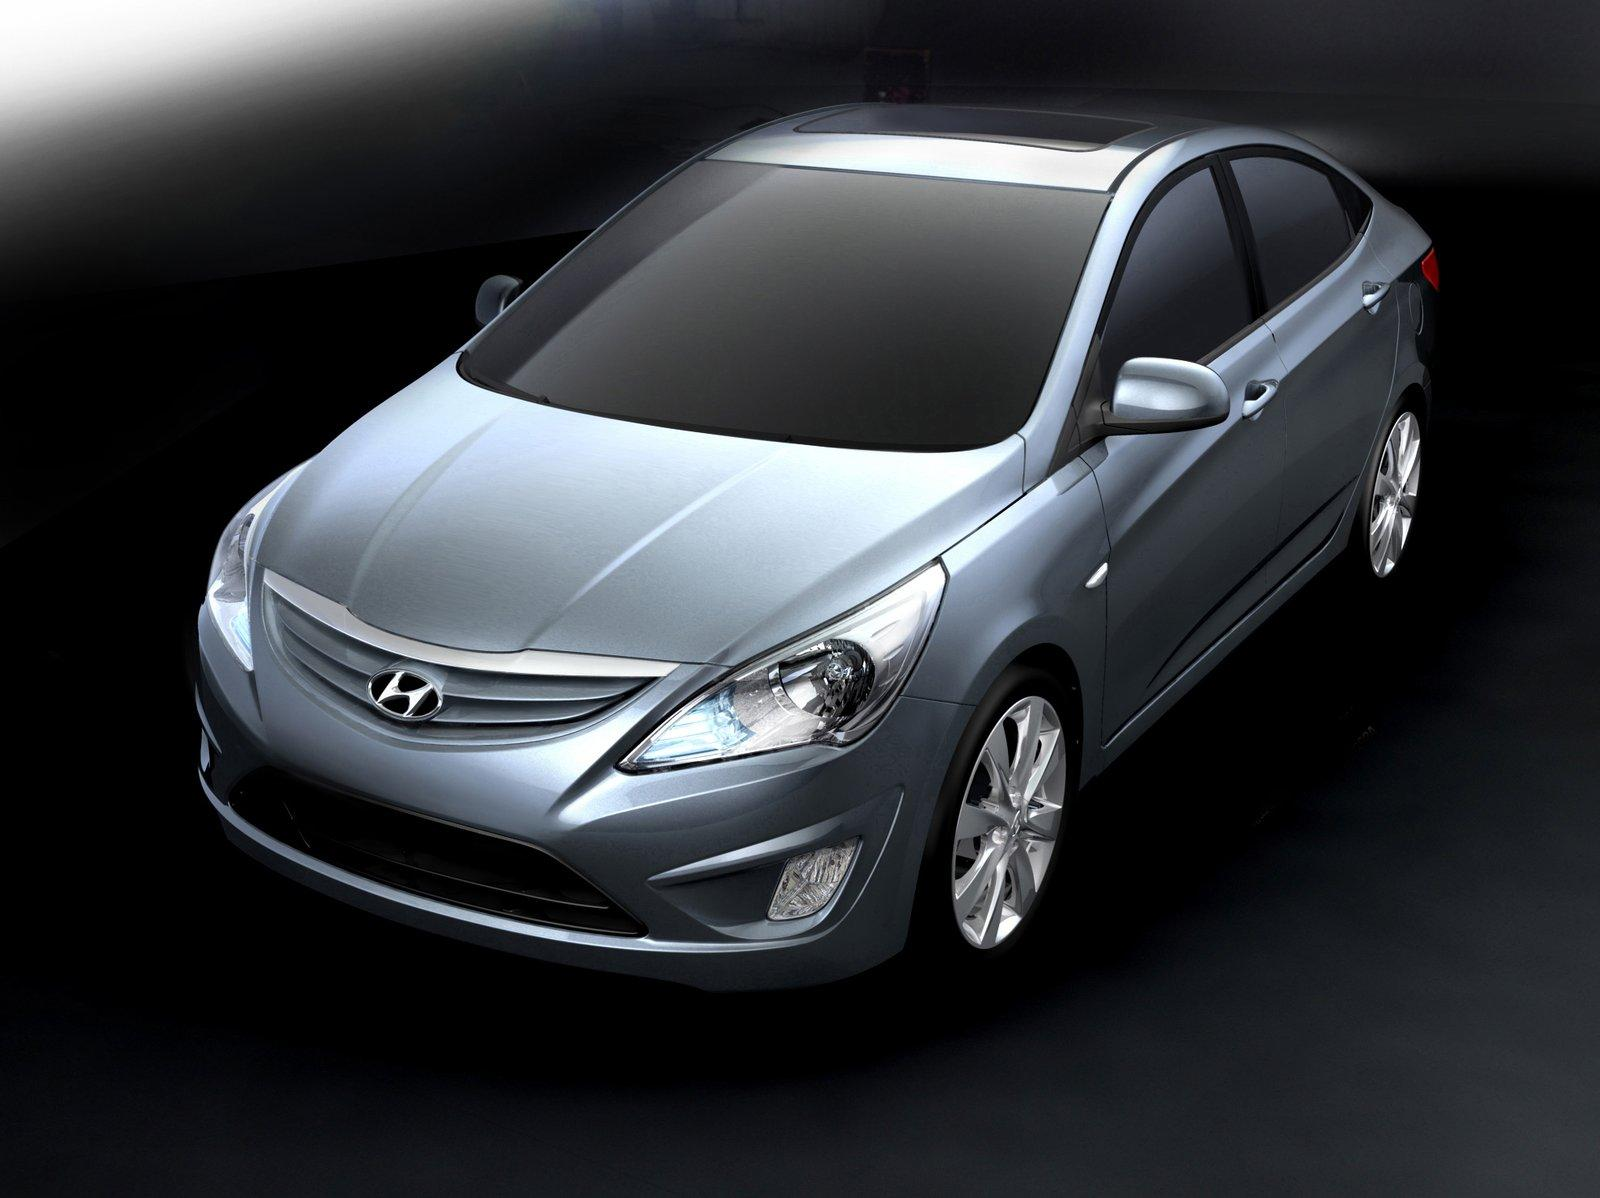 http://3.bp.blogspot.com/_J3_liDBfbvs/S9OjjOyhp1I/AAAAAAAAohQ/ajyY-OJPMUA/s1600/2011-Hyundai-Verna-Accent-Front-Top-Side-View.jpg